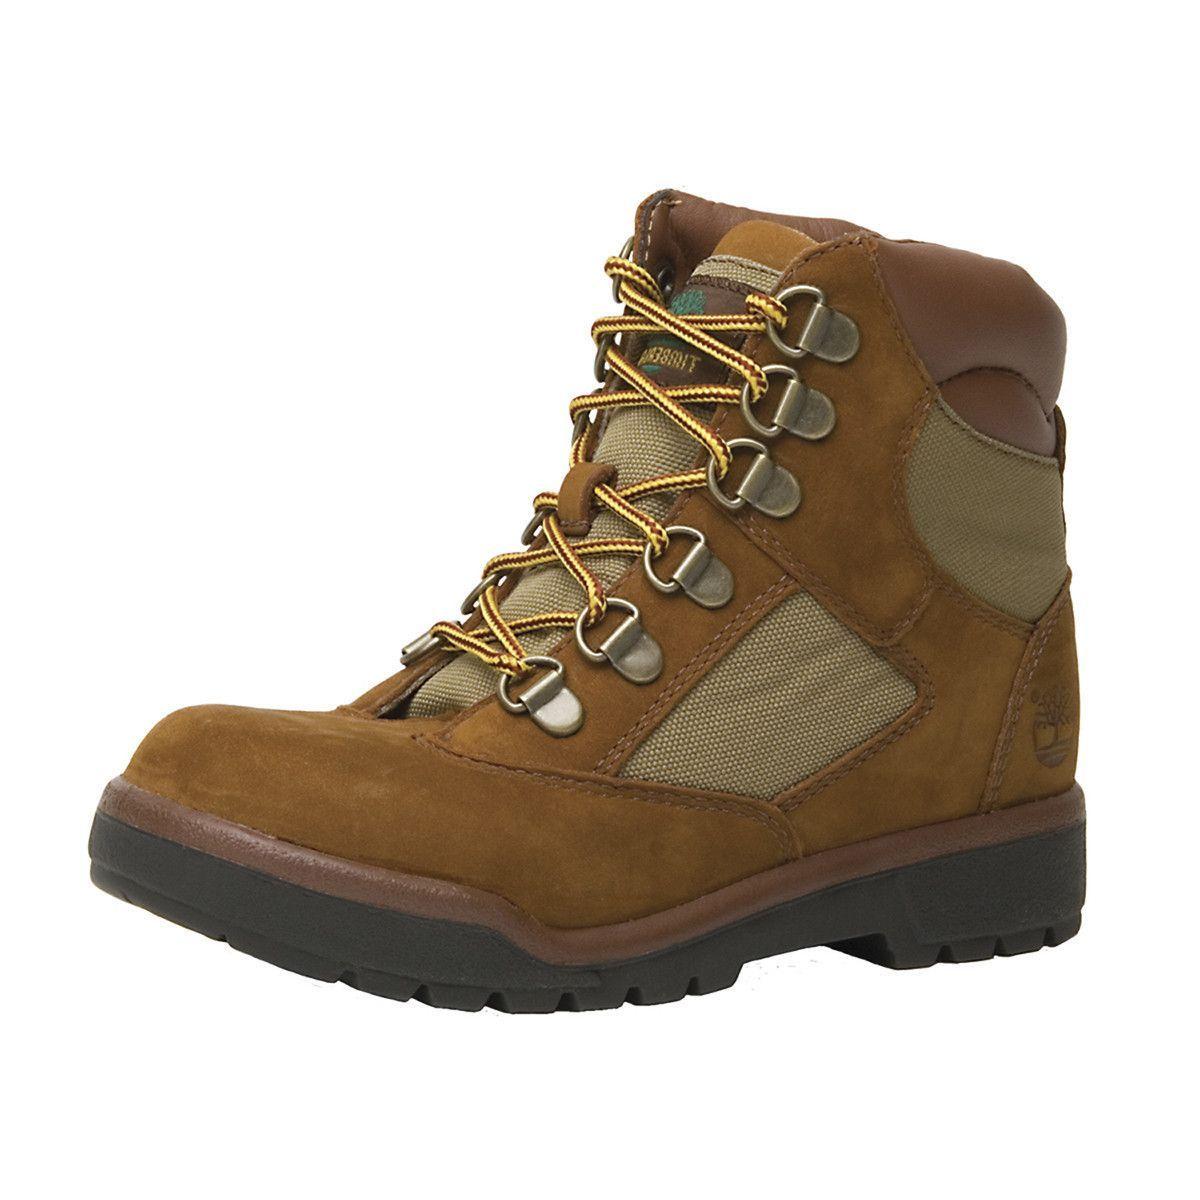 Timberland - 6 Inch Field Hiking Boot (Big Kid) - Sundance Brown